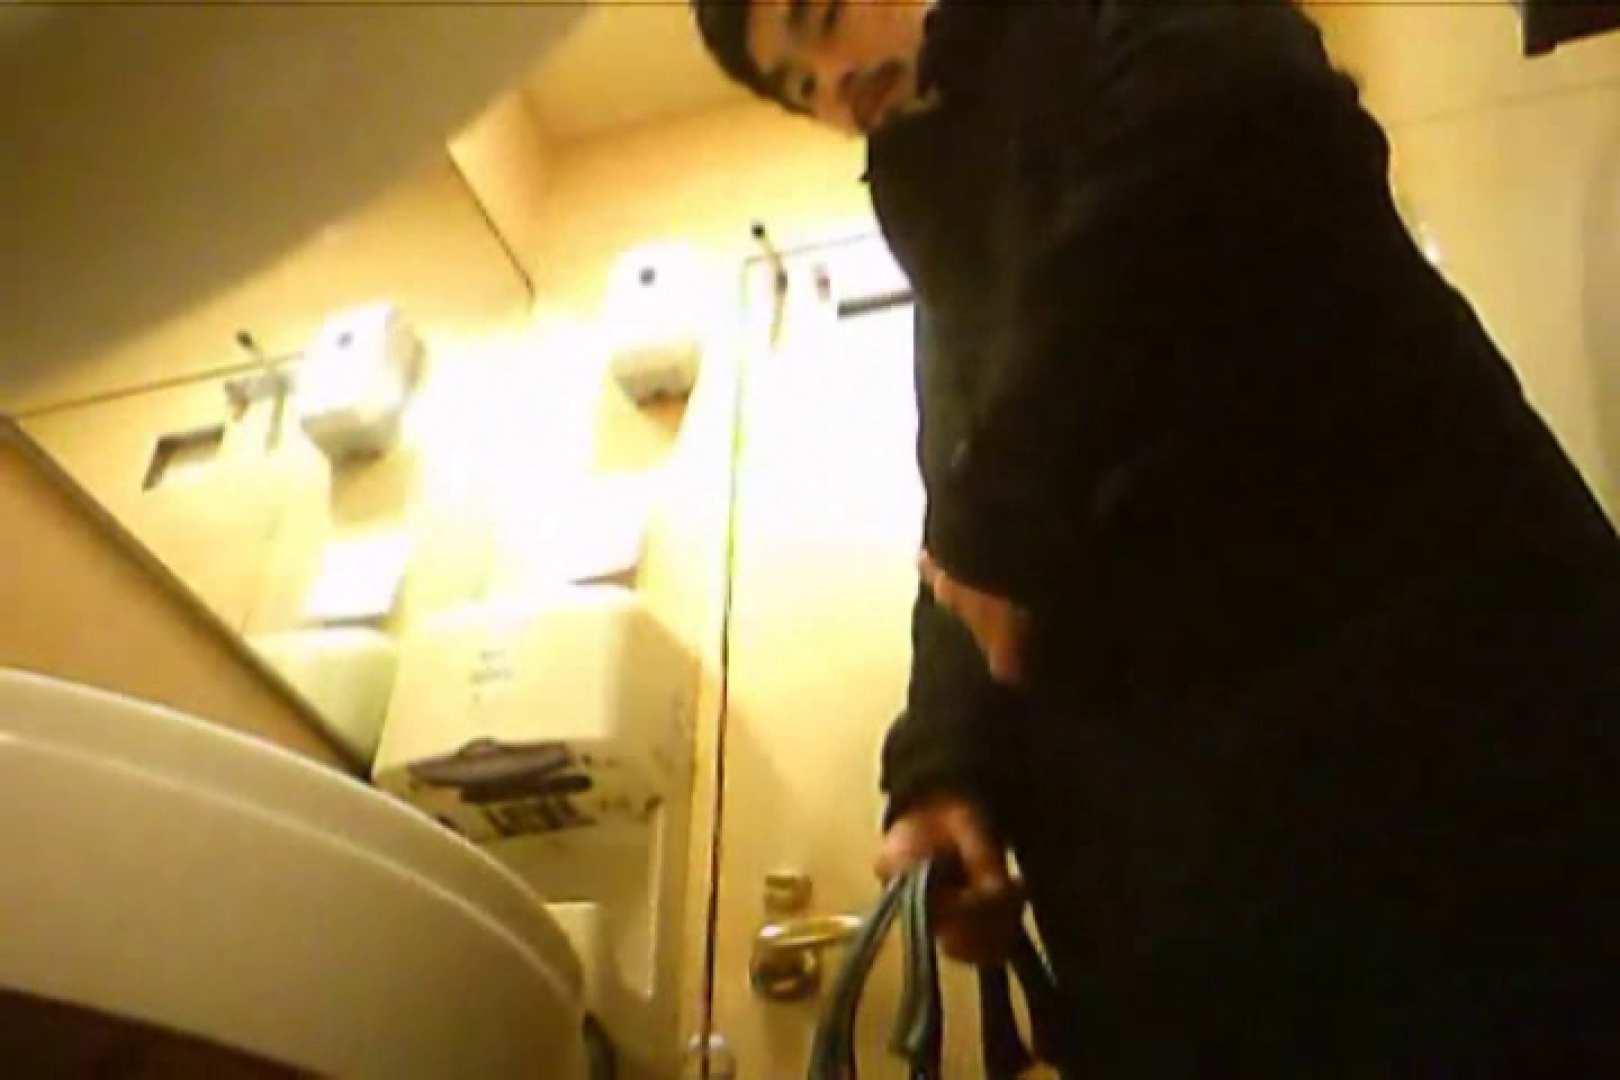 SEASON 2ND!掴み取りさんの洗面所覗き!in新幹線!VOL.12 0 | スーツボーイズ  95pic 62